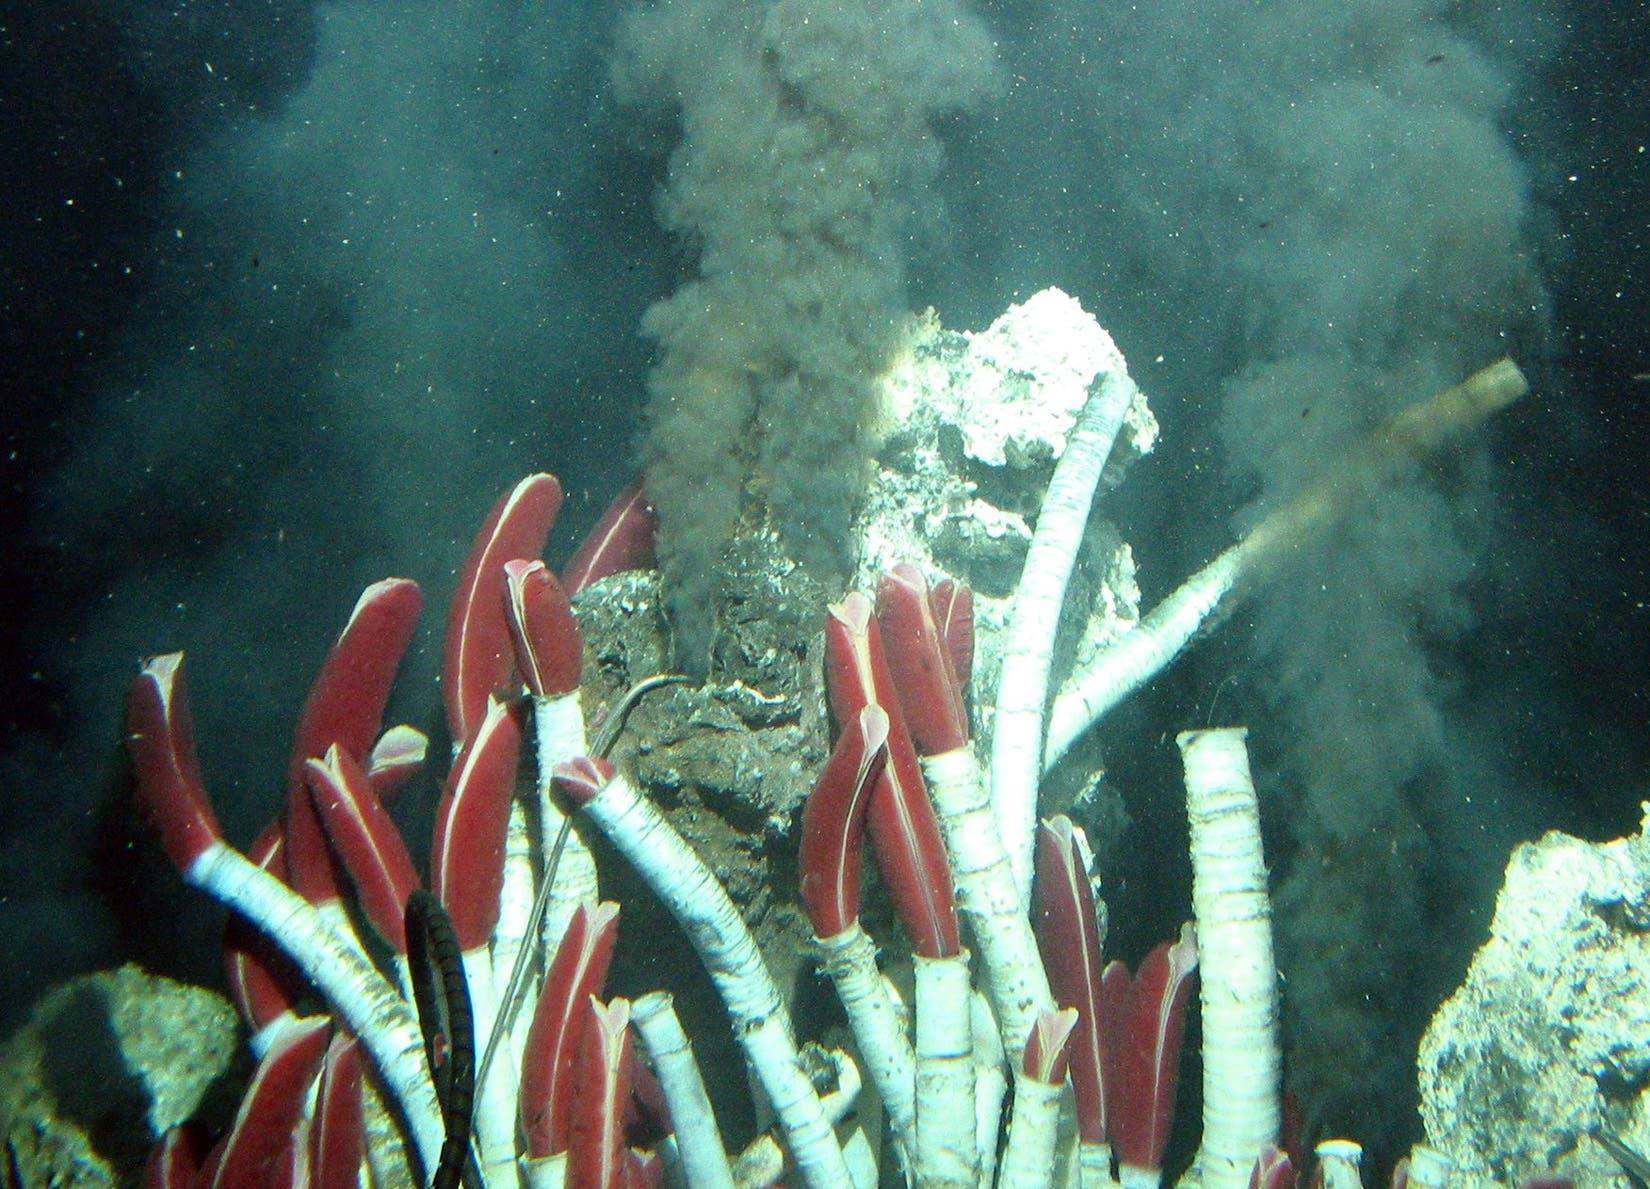 Röhrenwürmer in der Tiefsee